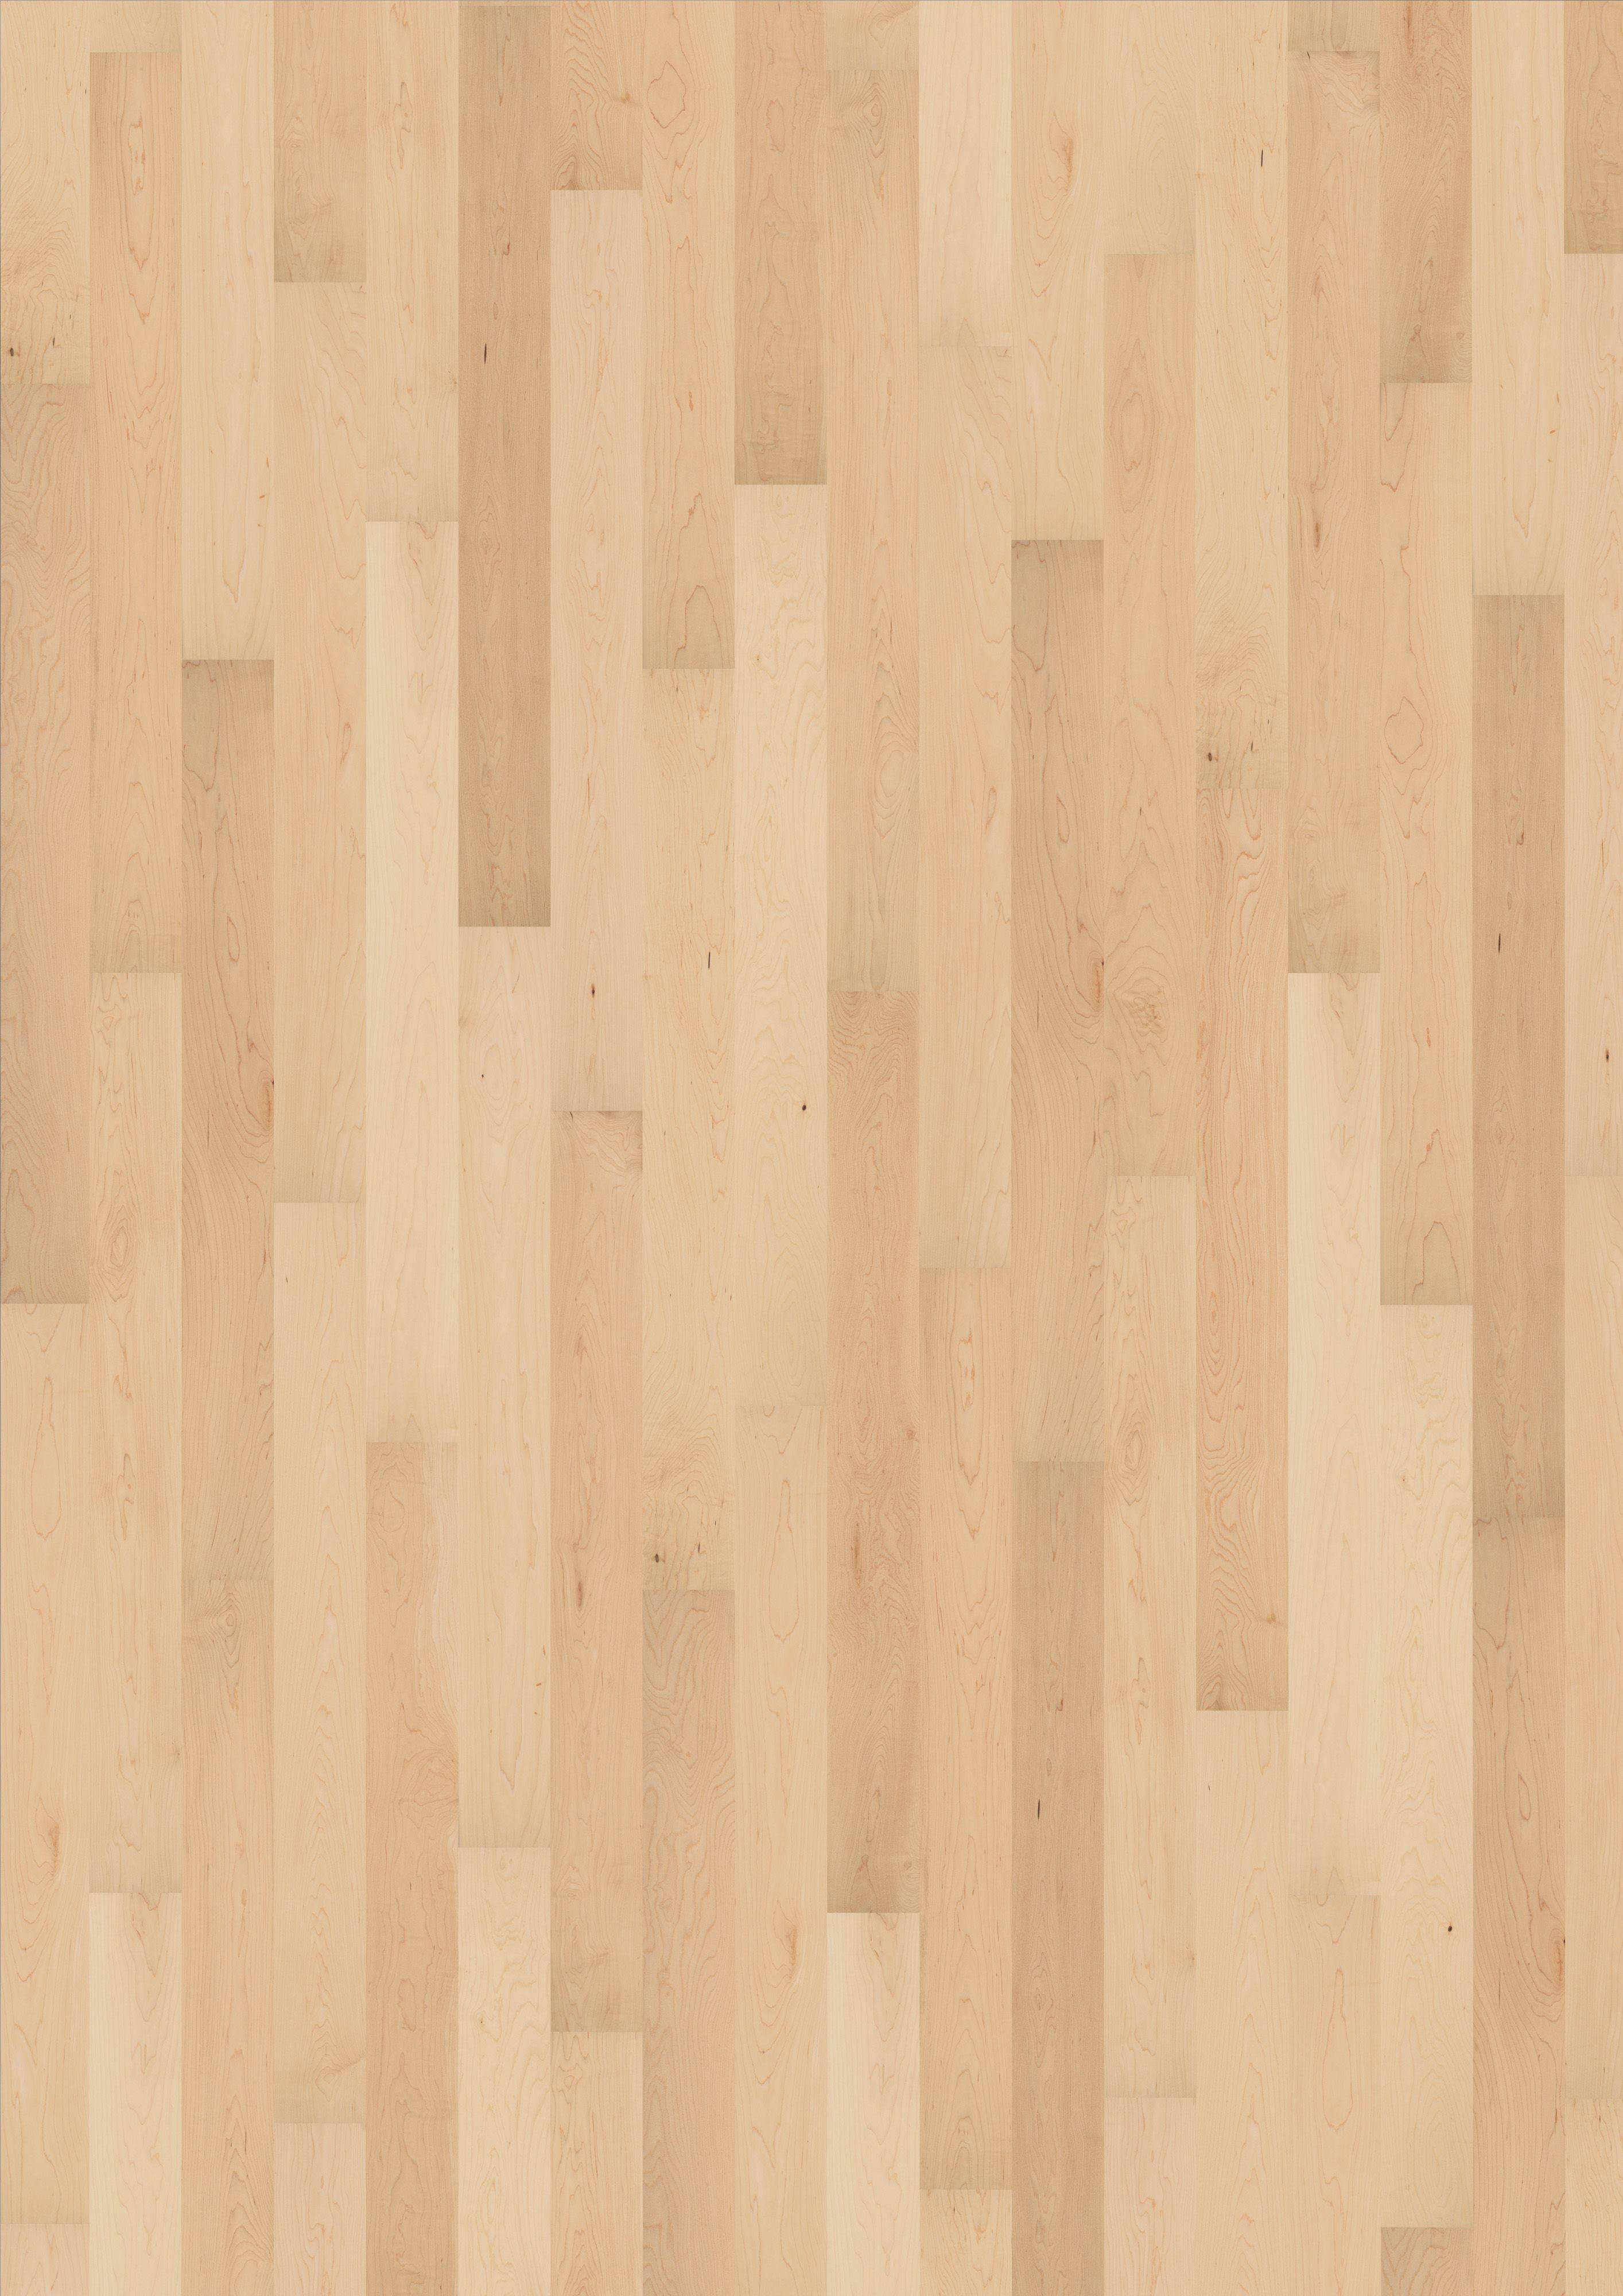 Kährs | Wood flooring | Parquet | Interior | Design | www.kahrs.com | Texturas photoshop ...